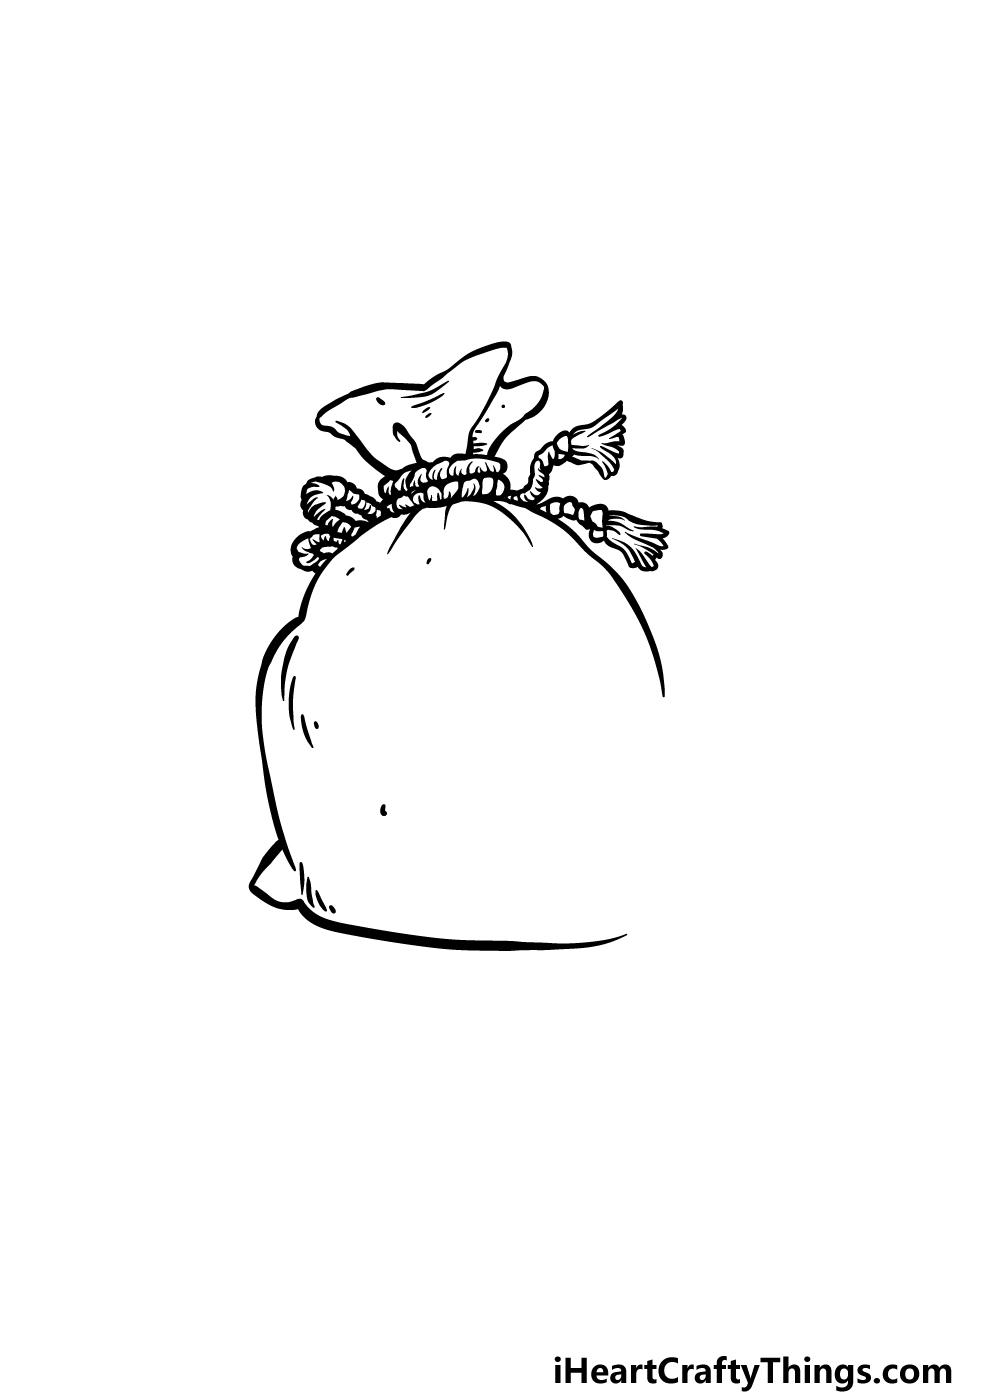 drawing a money bag step 3